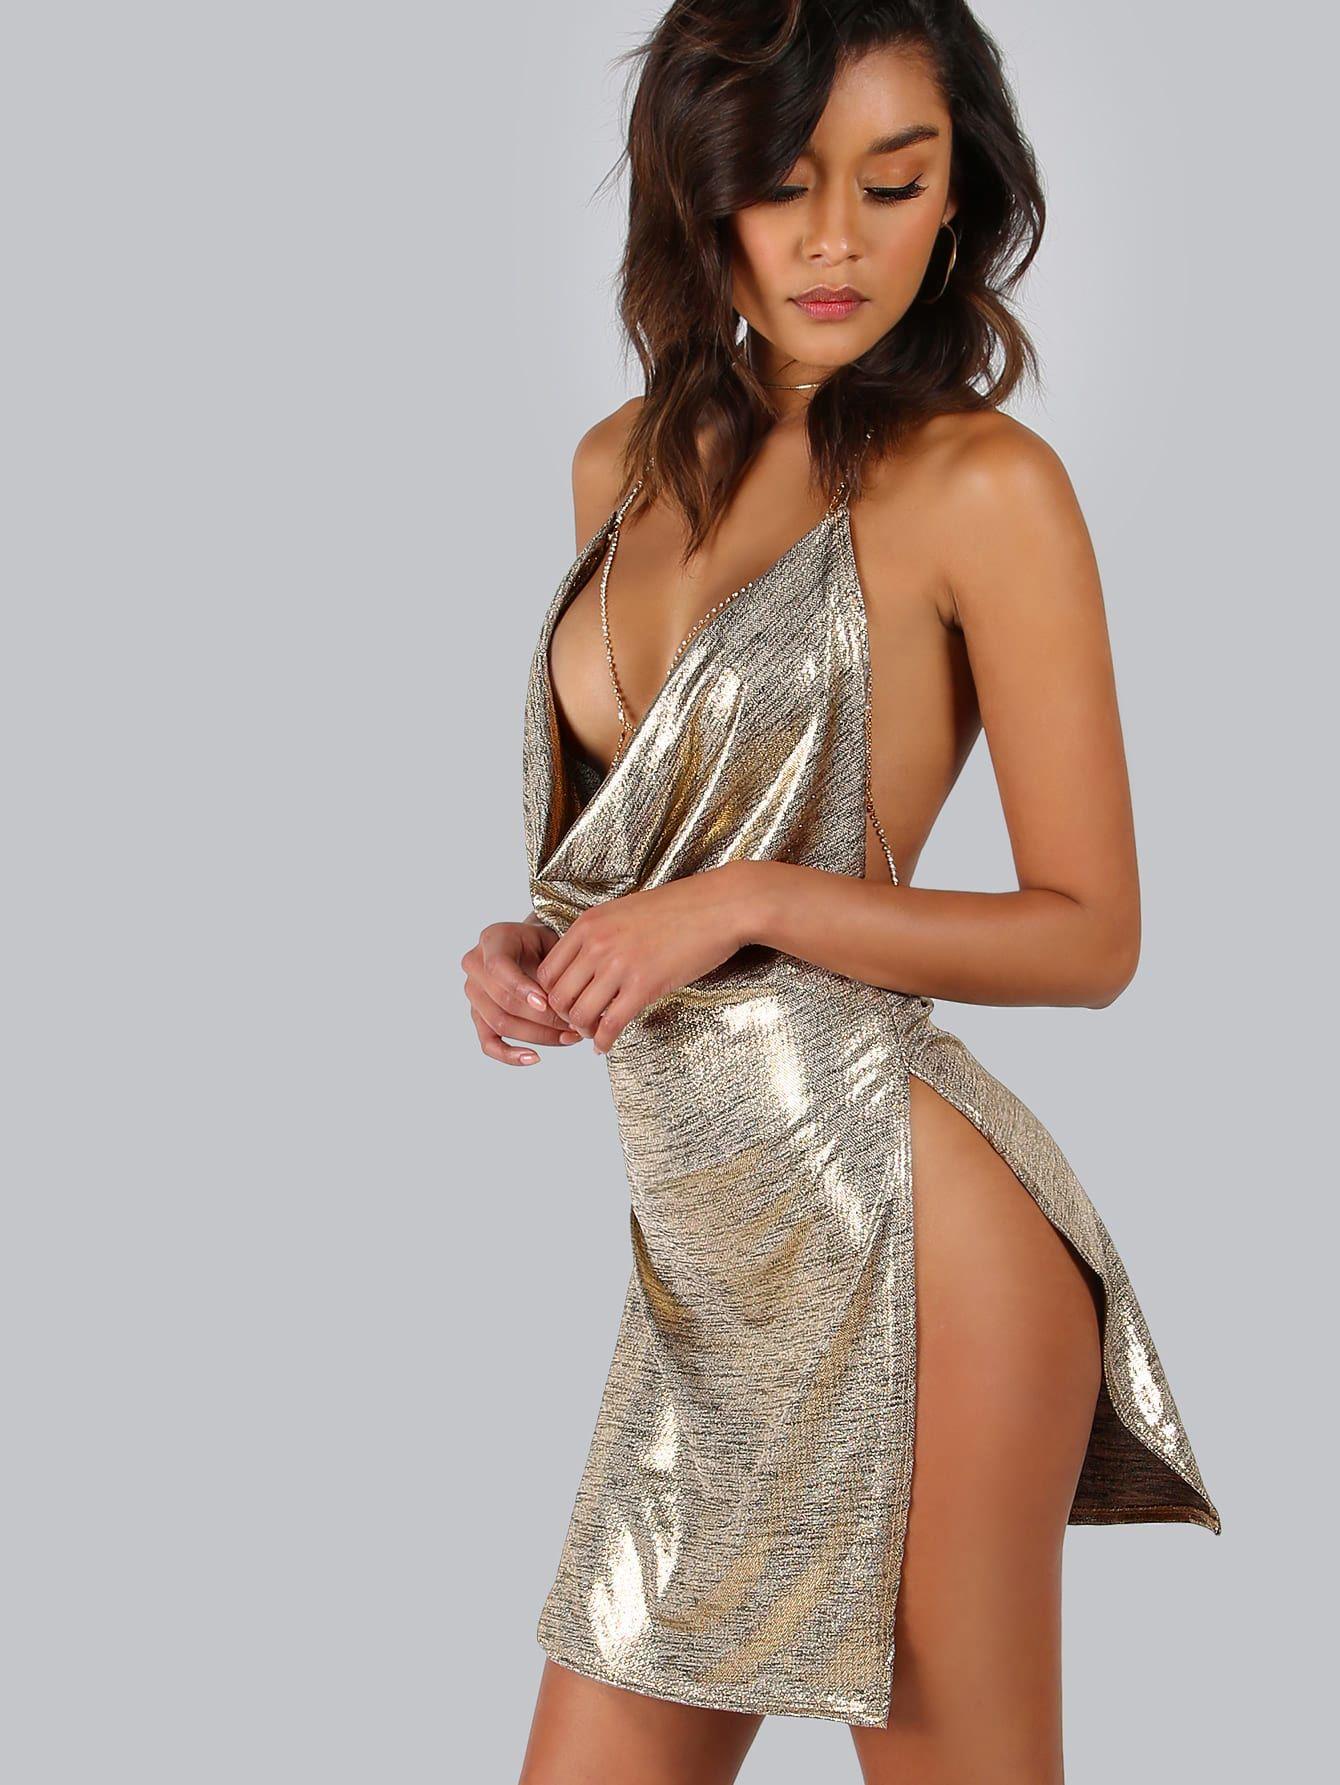 Backless Metallic Plunge Cowl Slit Dress -SheIn(Sheinside) e4e13eb29b9e